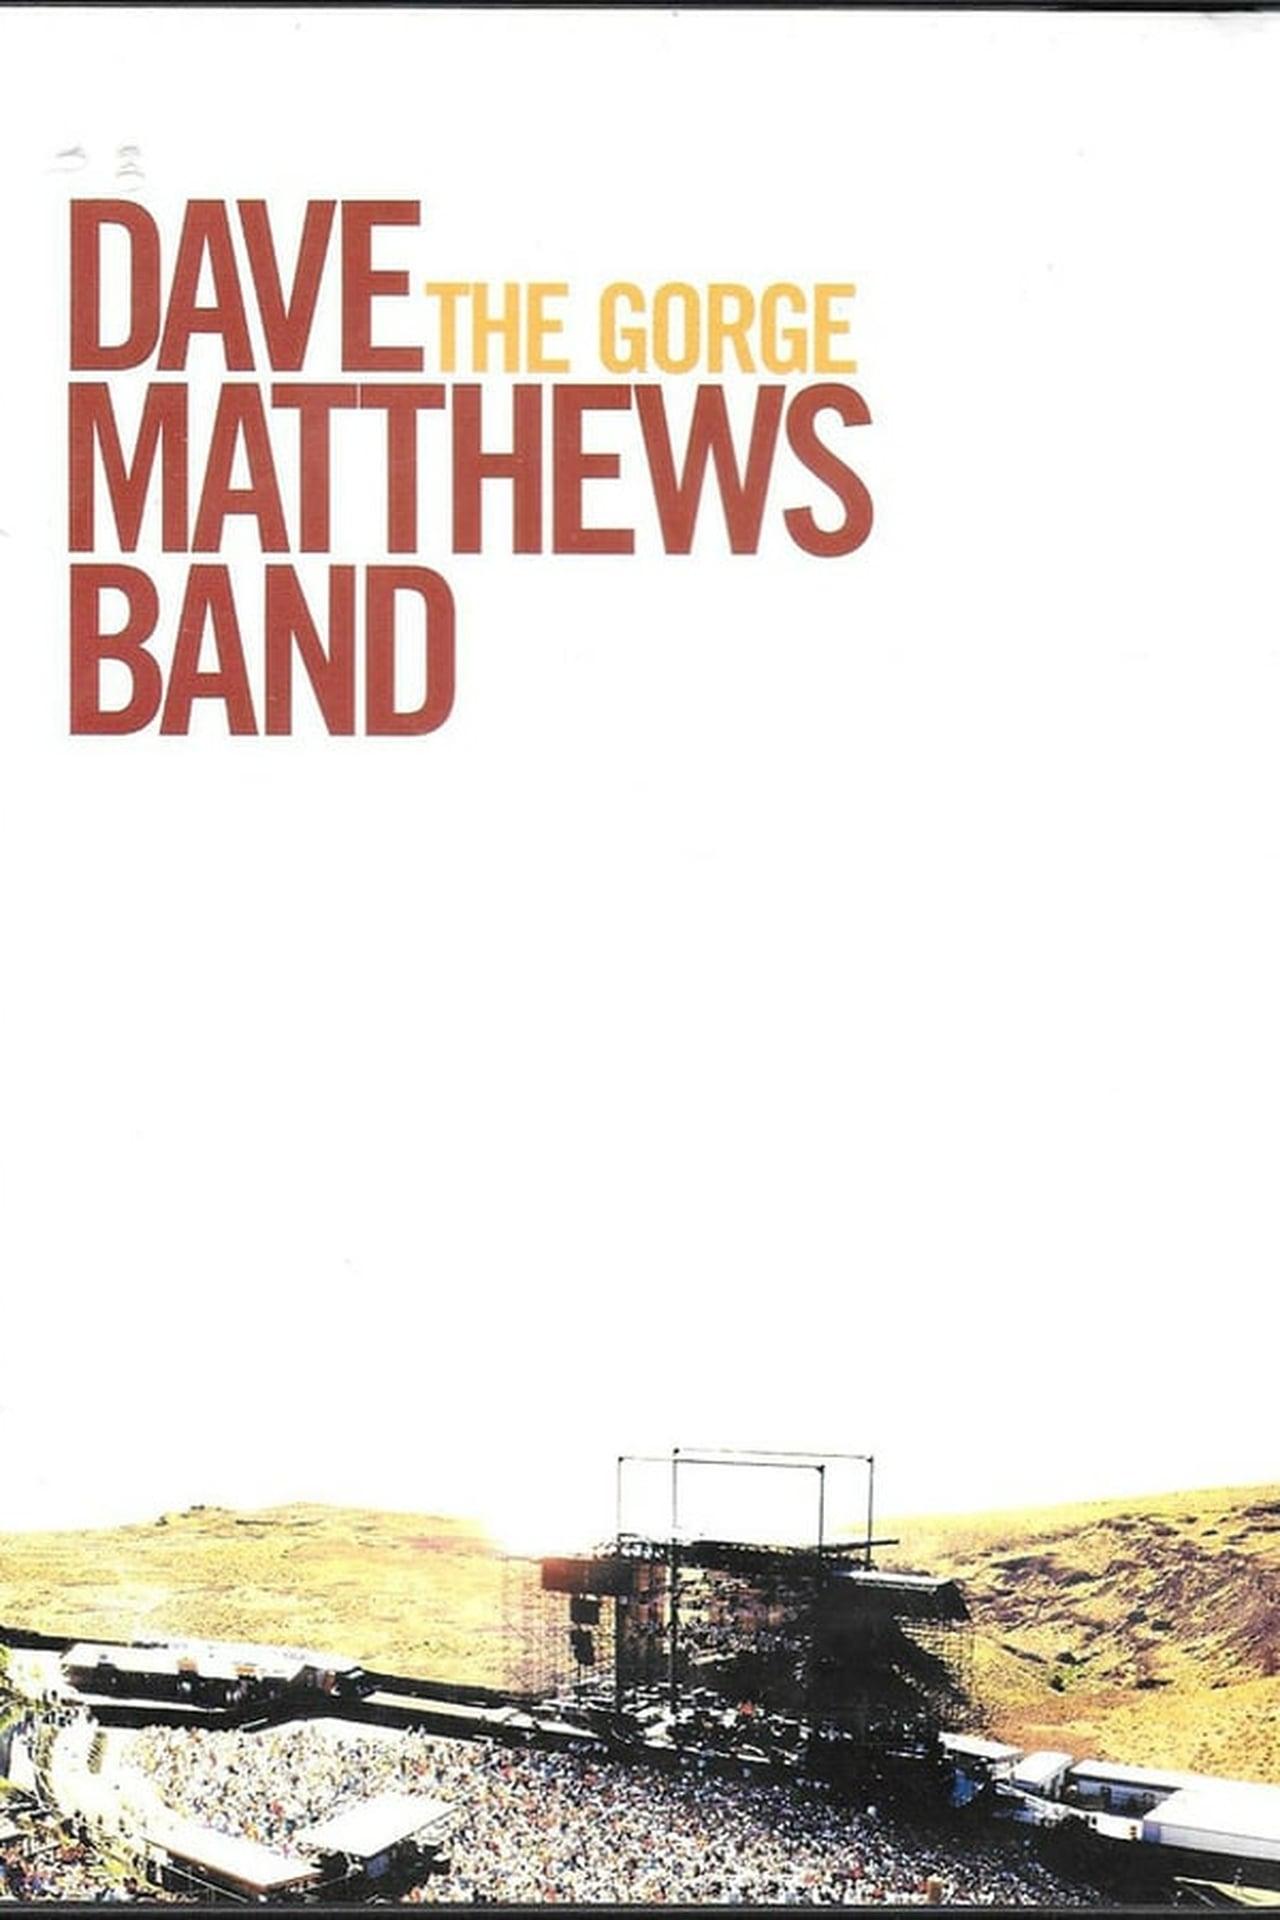 Dave Matthews Band: The Gorge